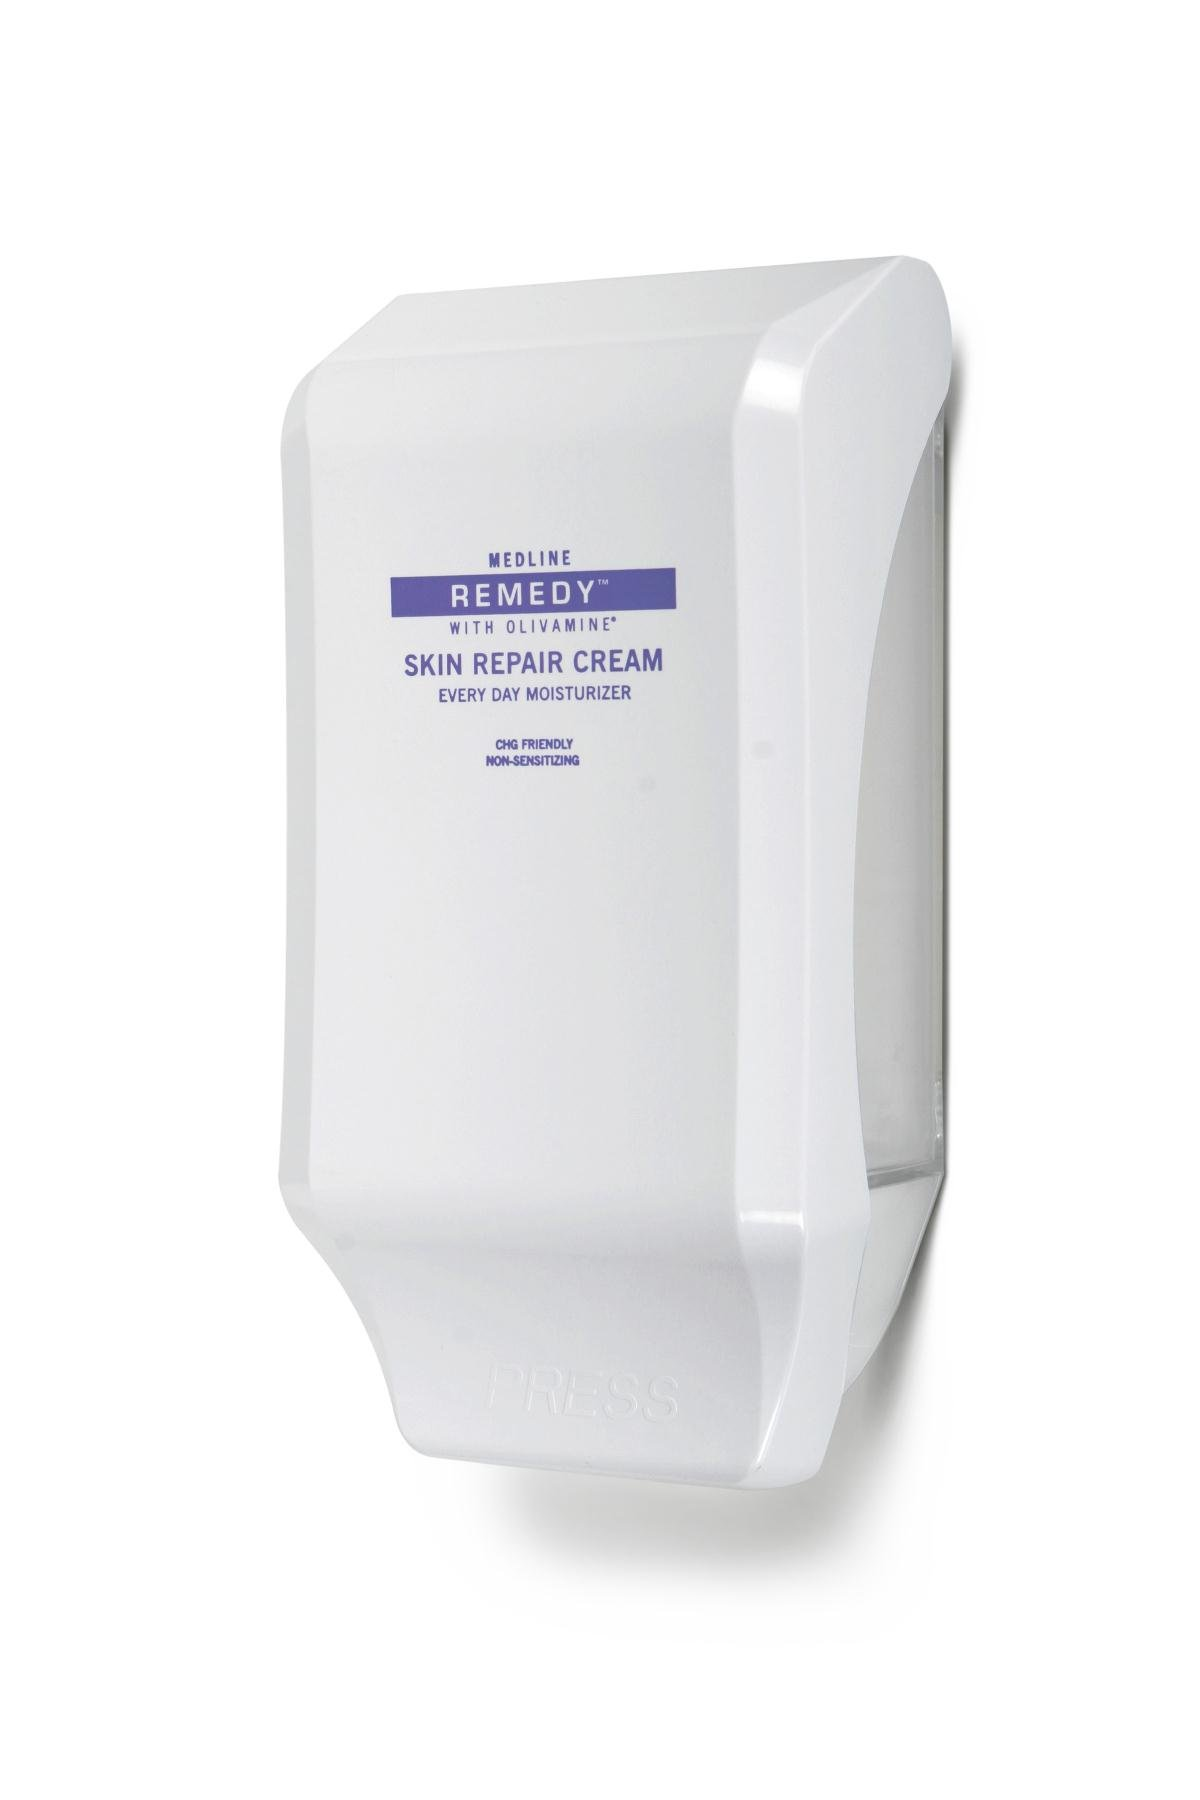 Medline MSC094412WD Remedy Skin Repair Cream Wall Dispensers, White (Case of 12)